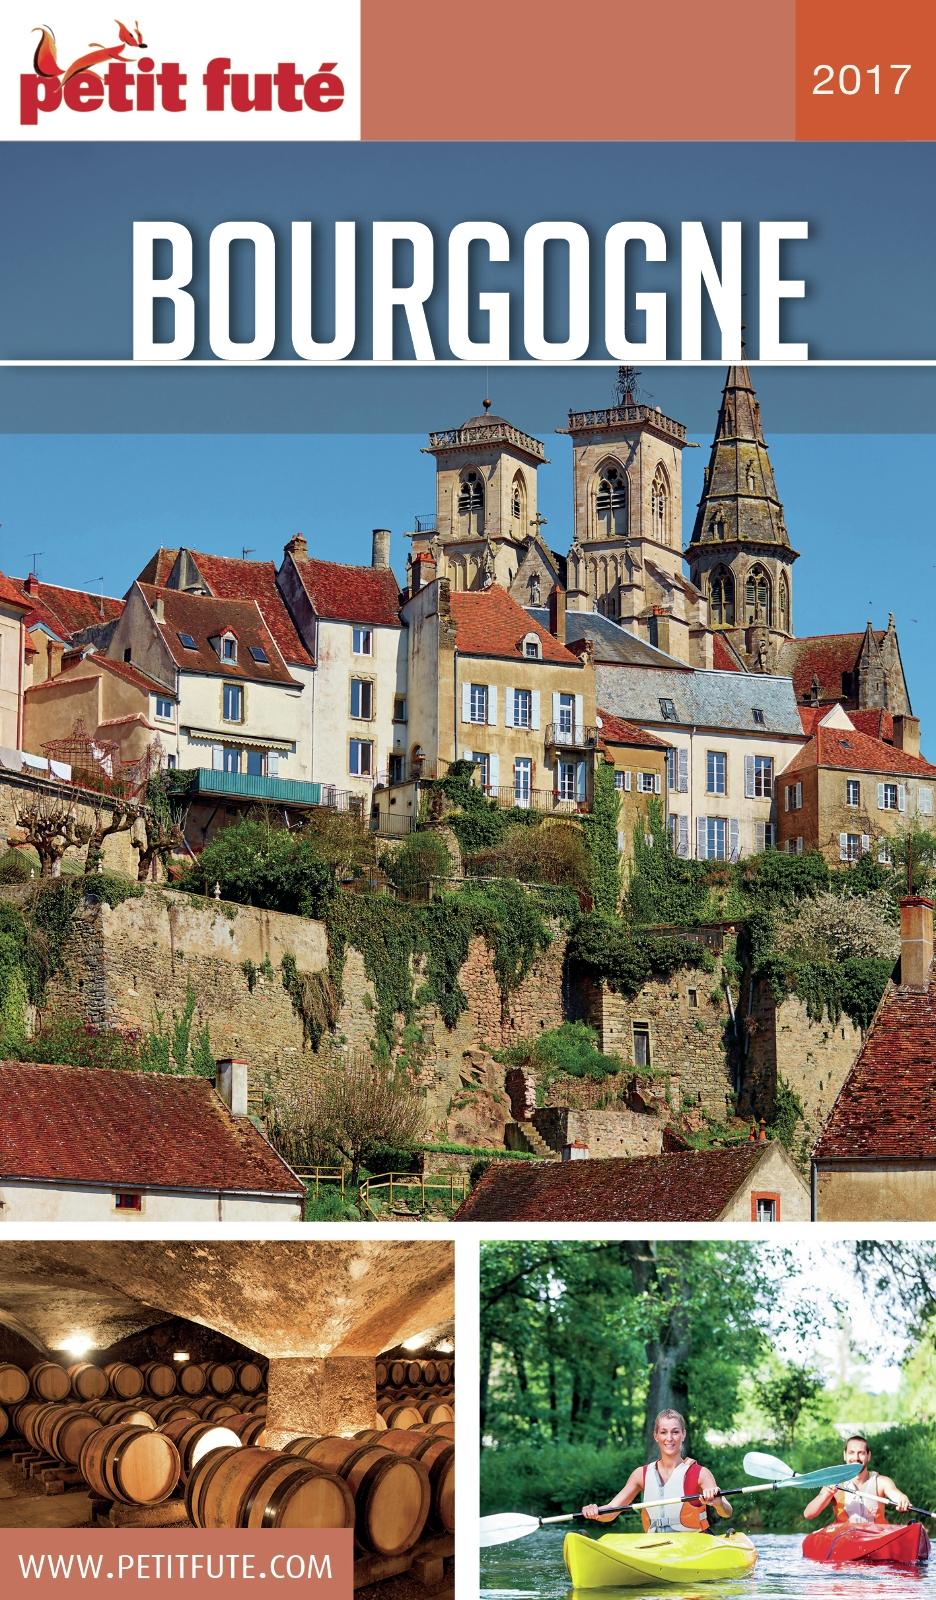 BOURGOGNE 2017 Petit Futé